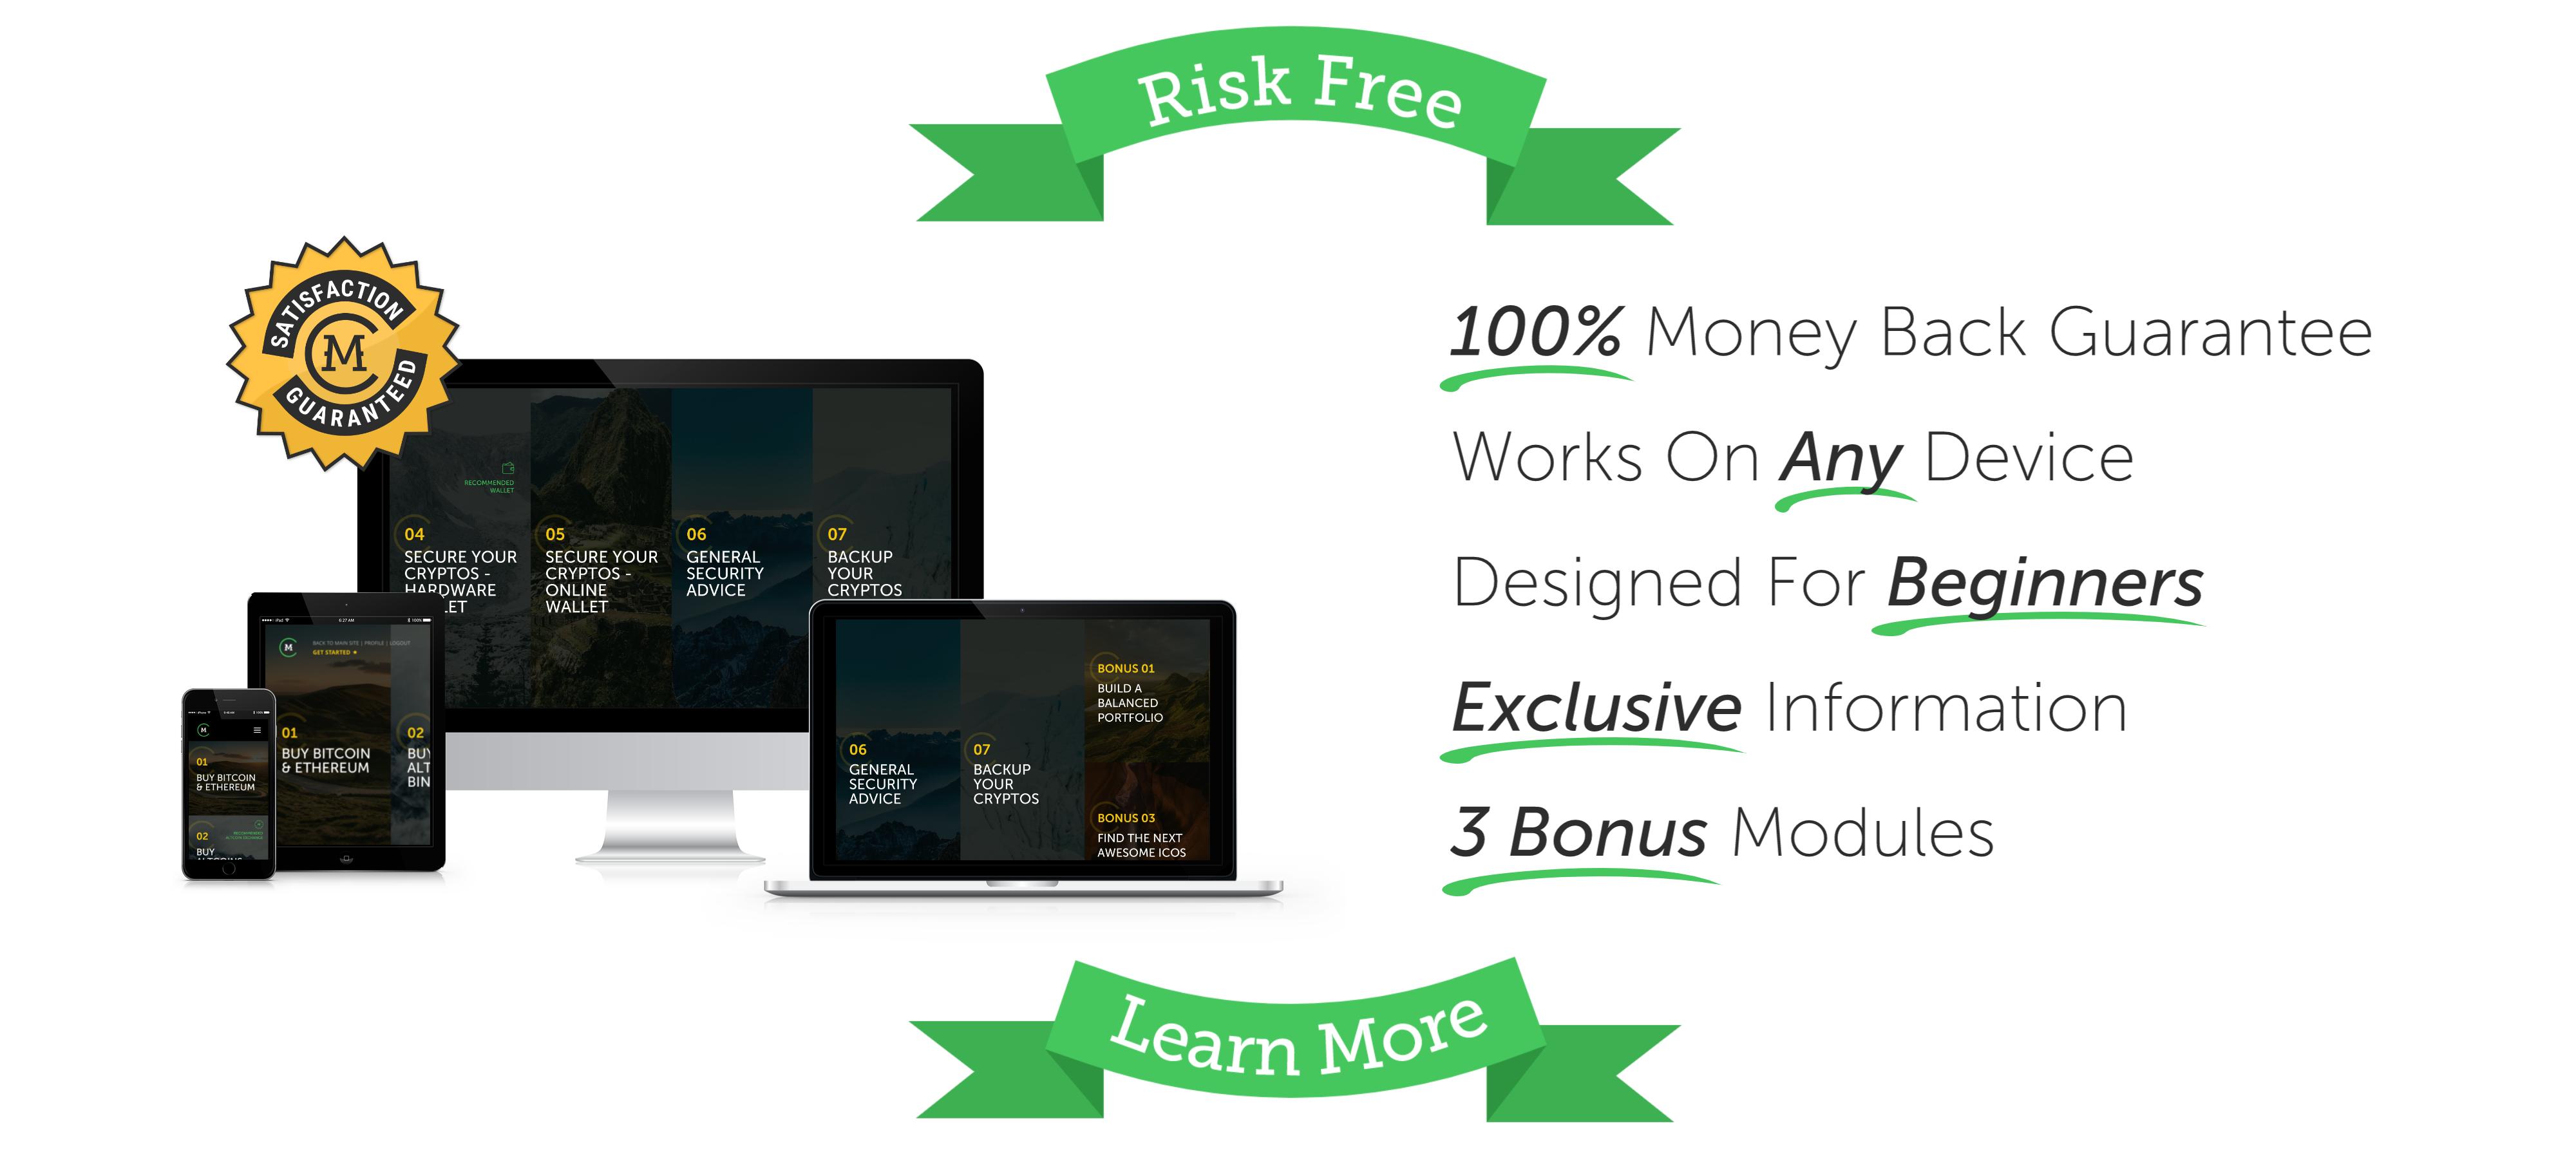 40% Commission | $20 Per Sale | Partners & Affiliate | Legitimate Opportunity